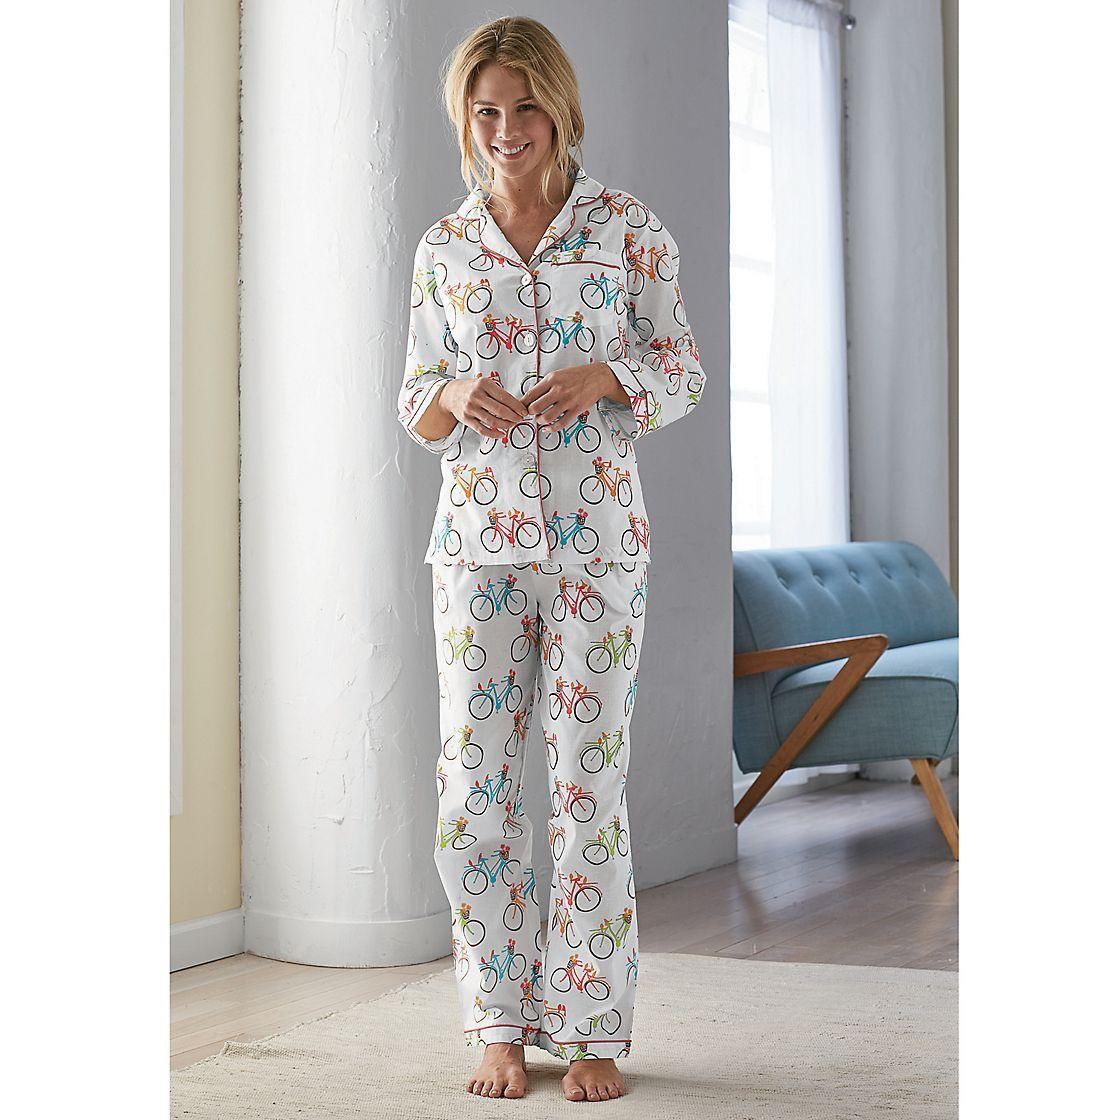 aa82a2298 Joy Ride Summer Woven Cotton Women s Pajama Set